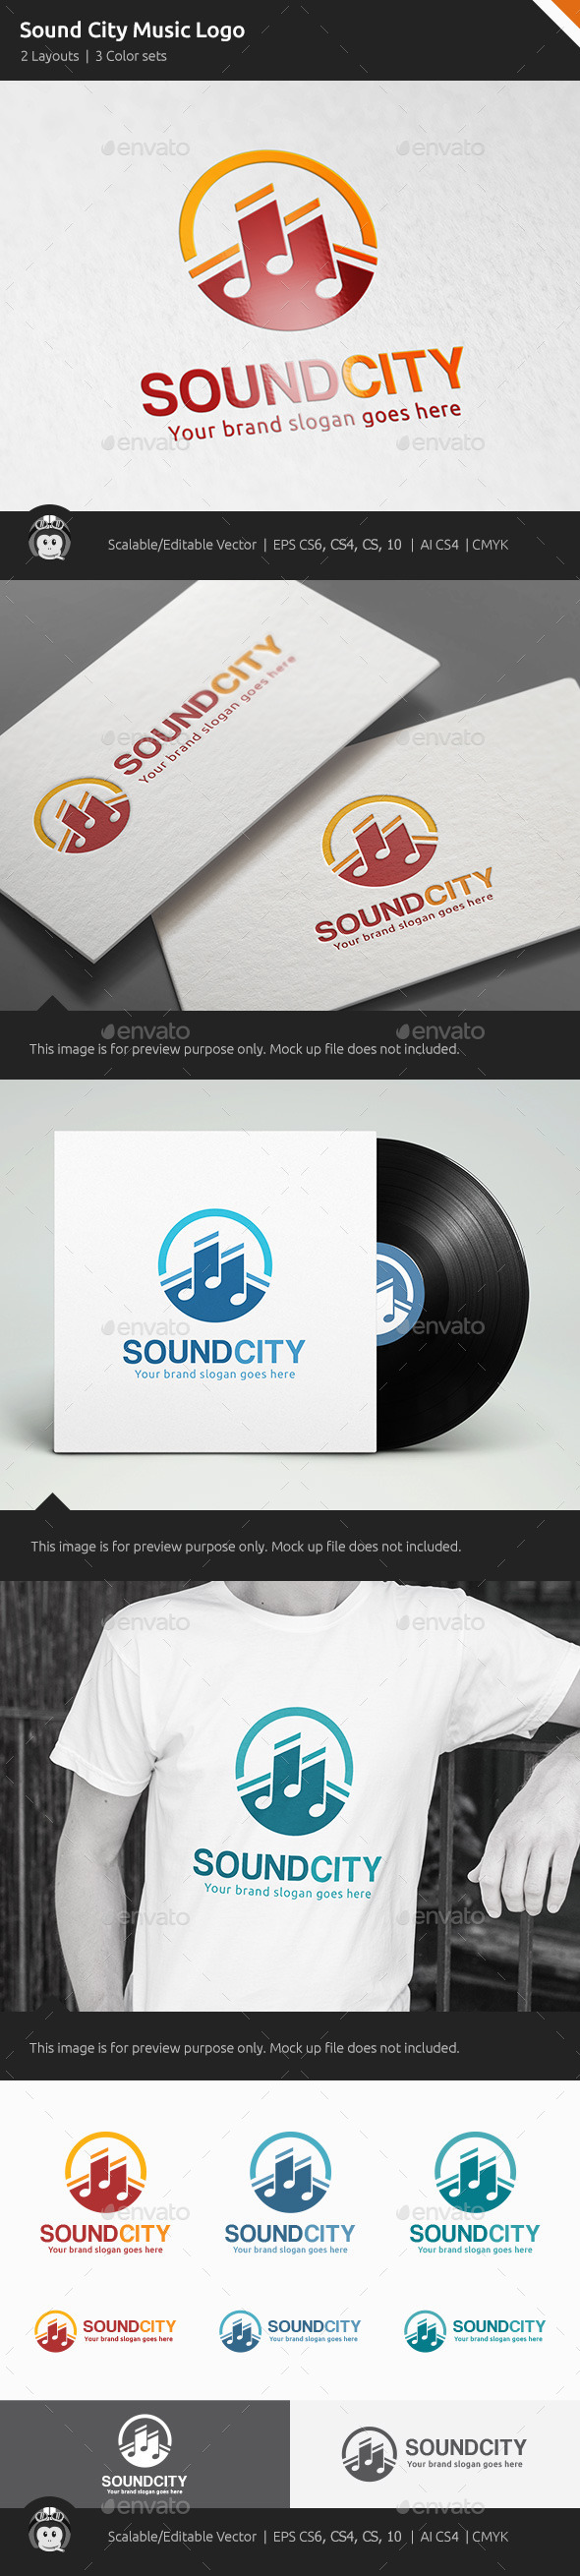 Sound City Music Logo